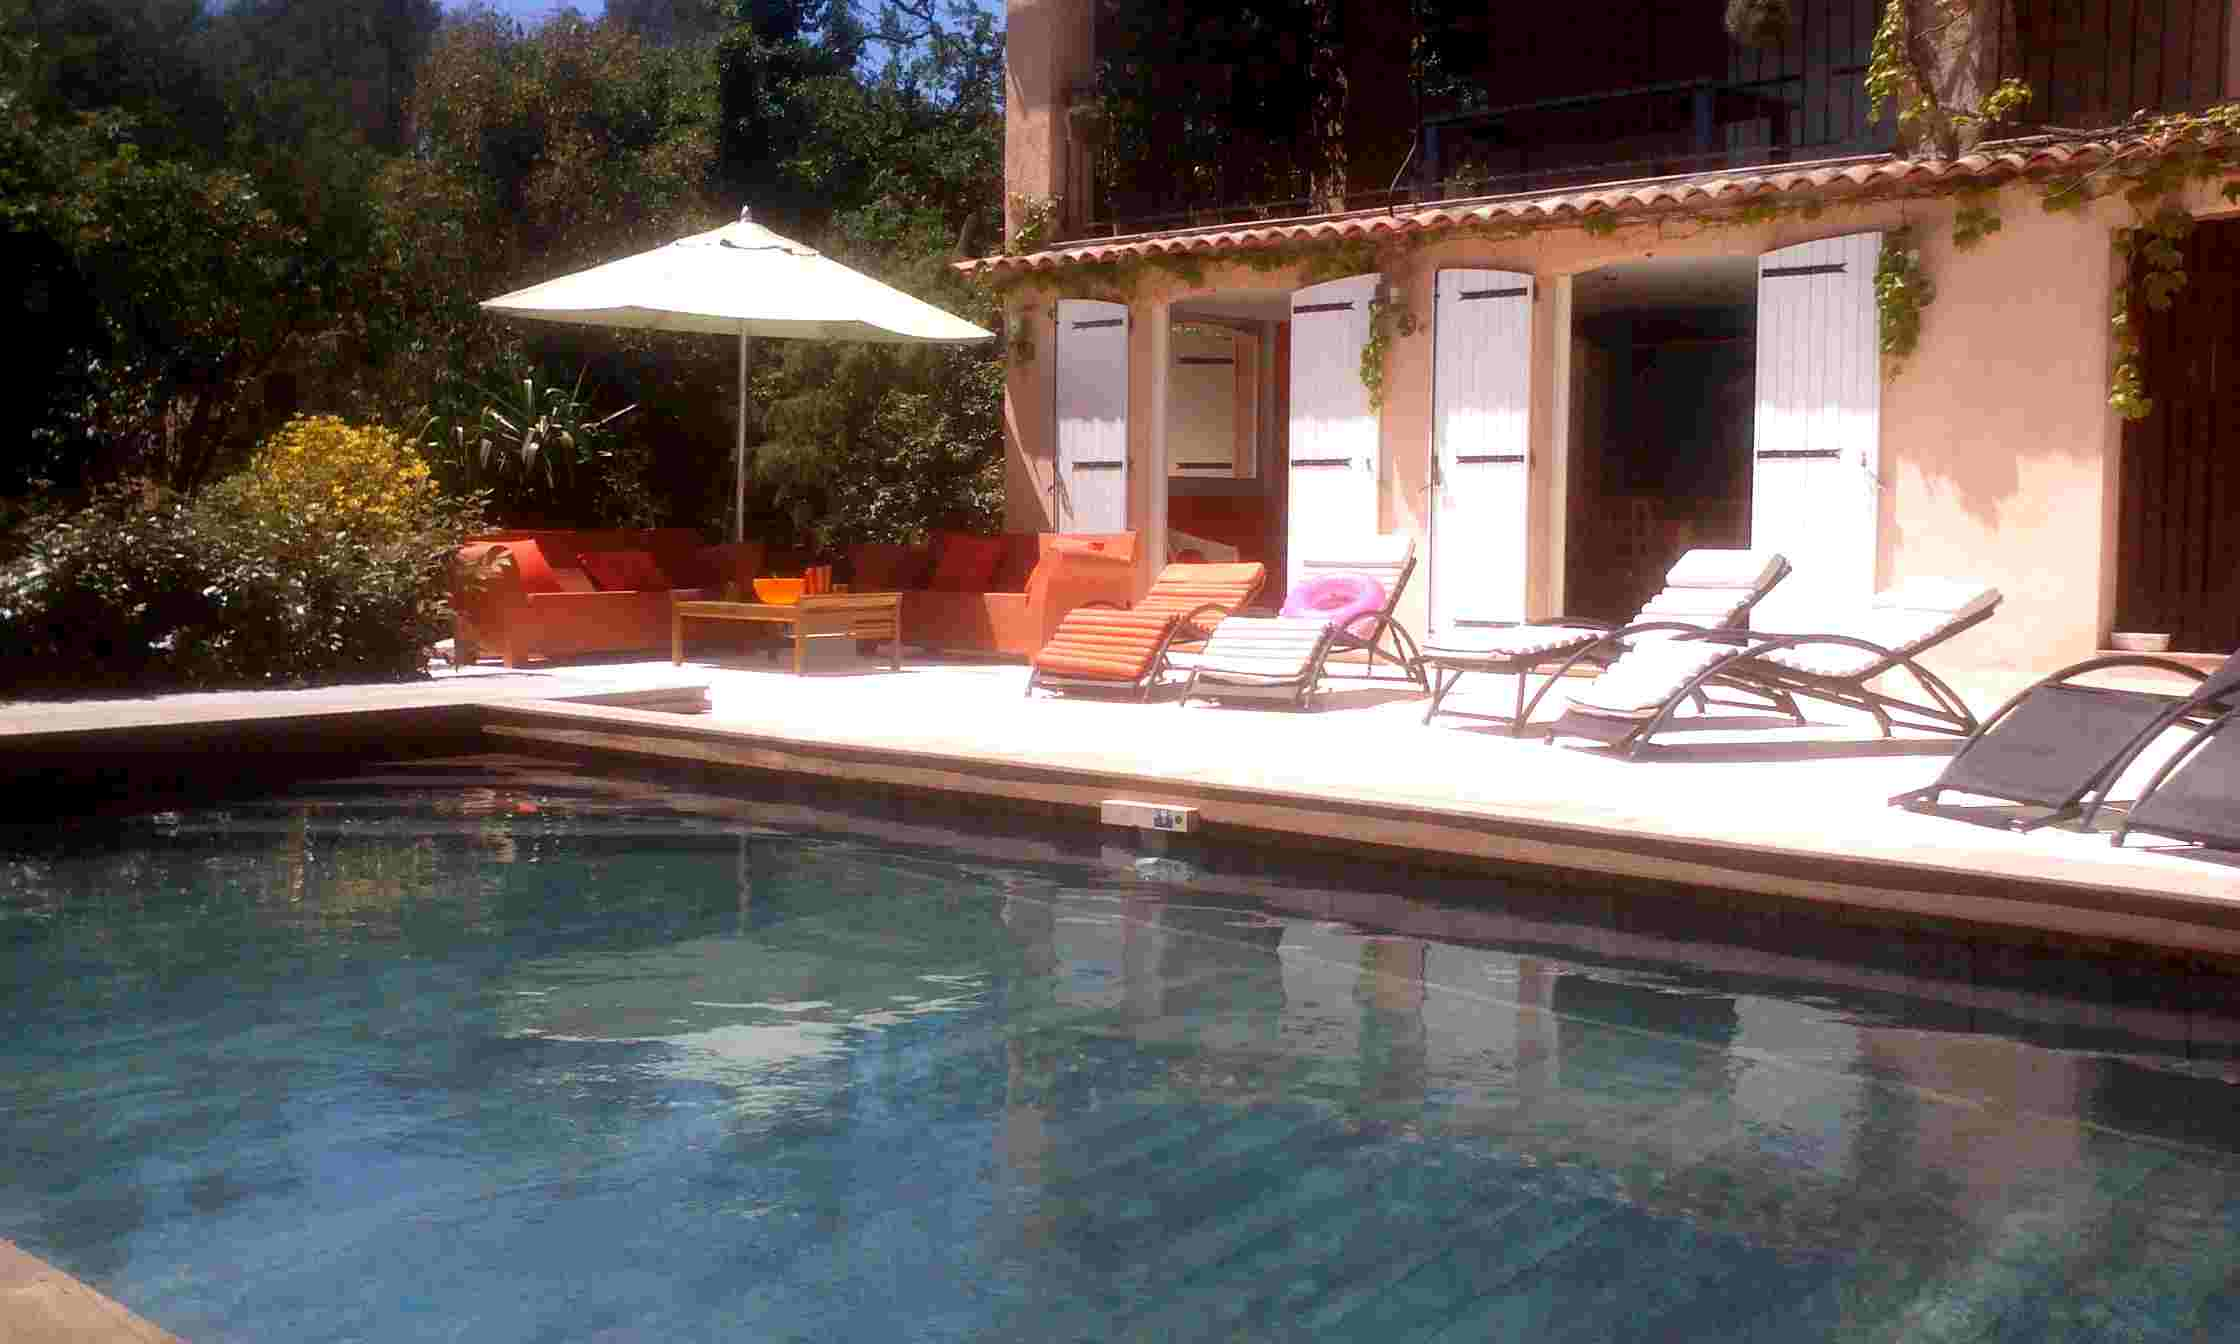 location villa vacances avec piscine prive saint raphael varlocation villa vacances avec piscine